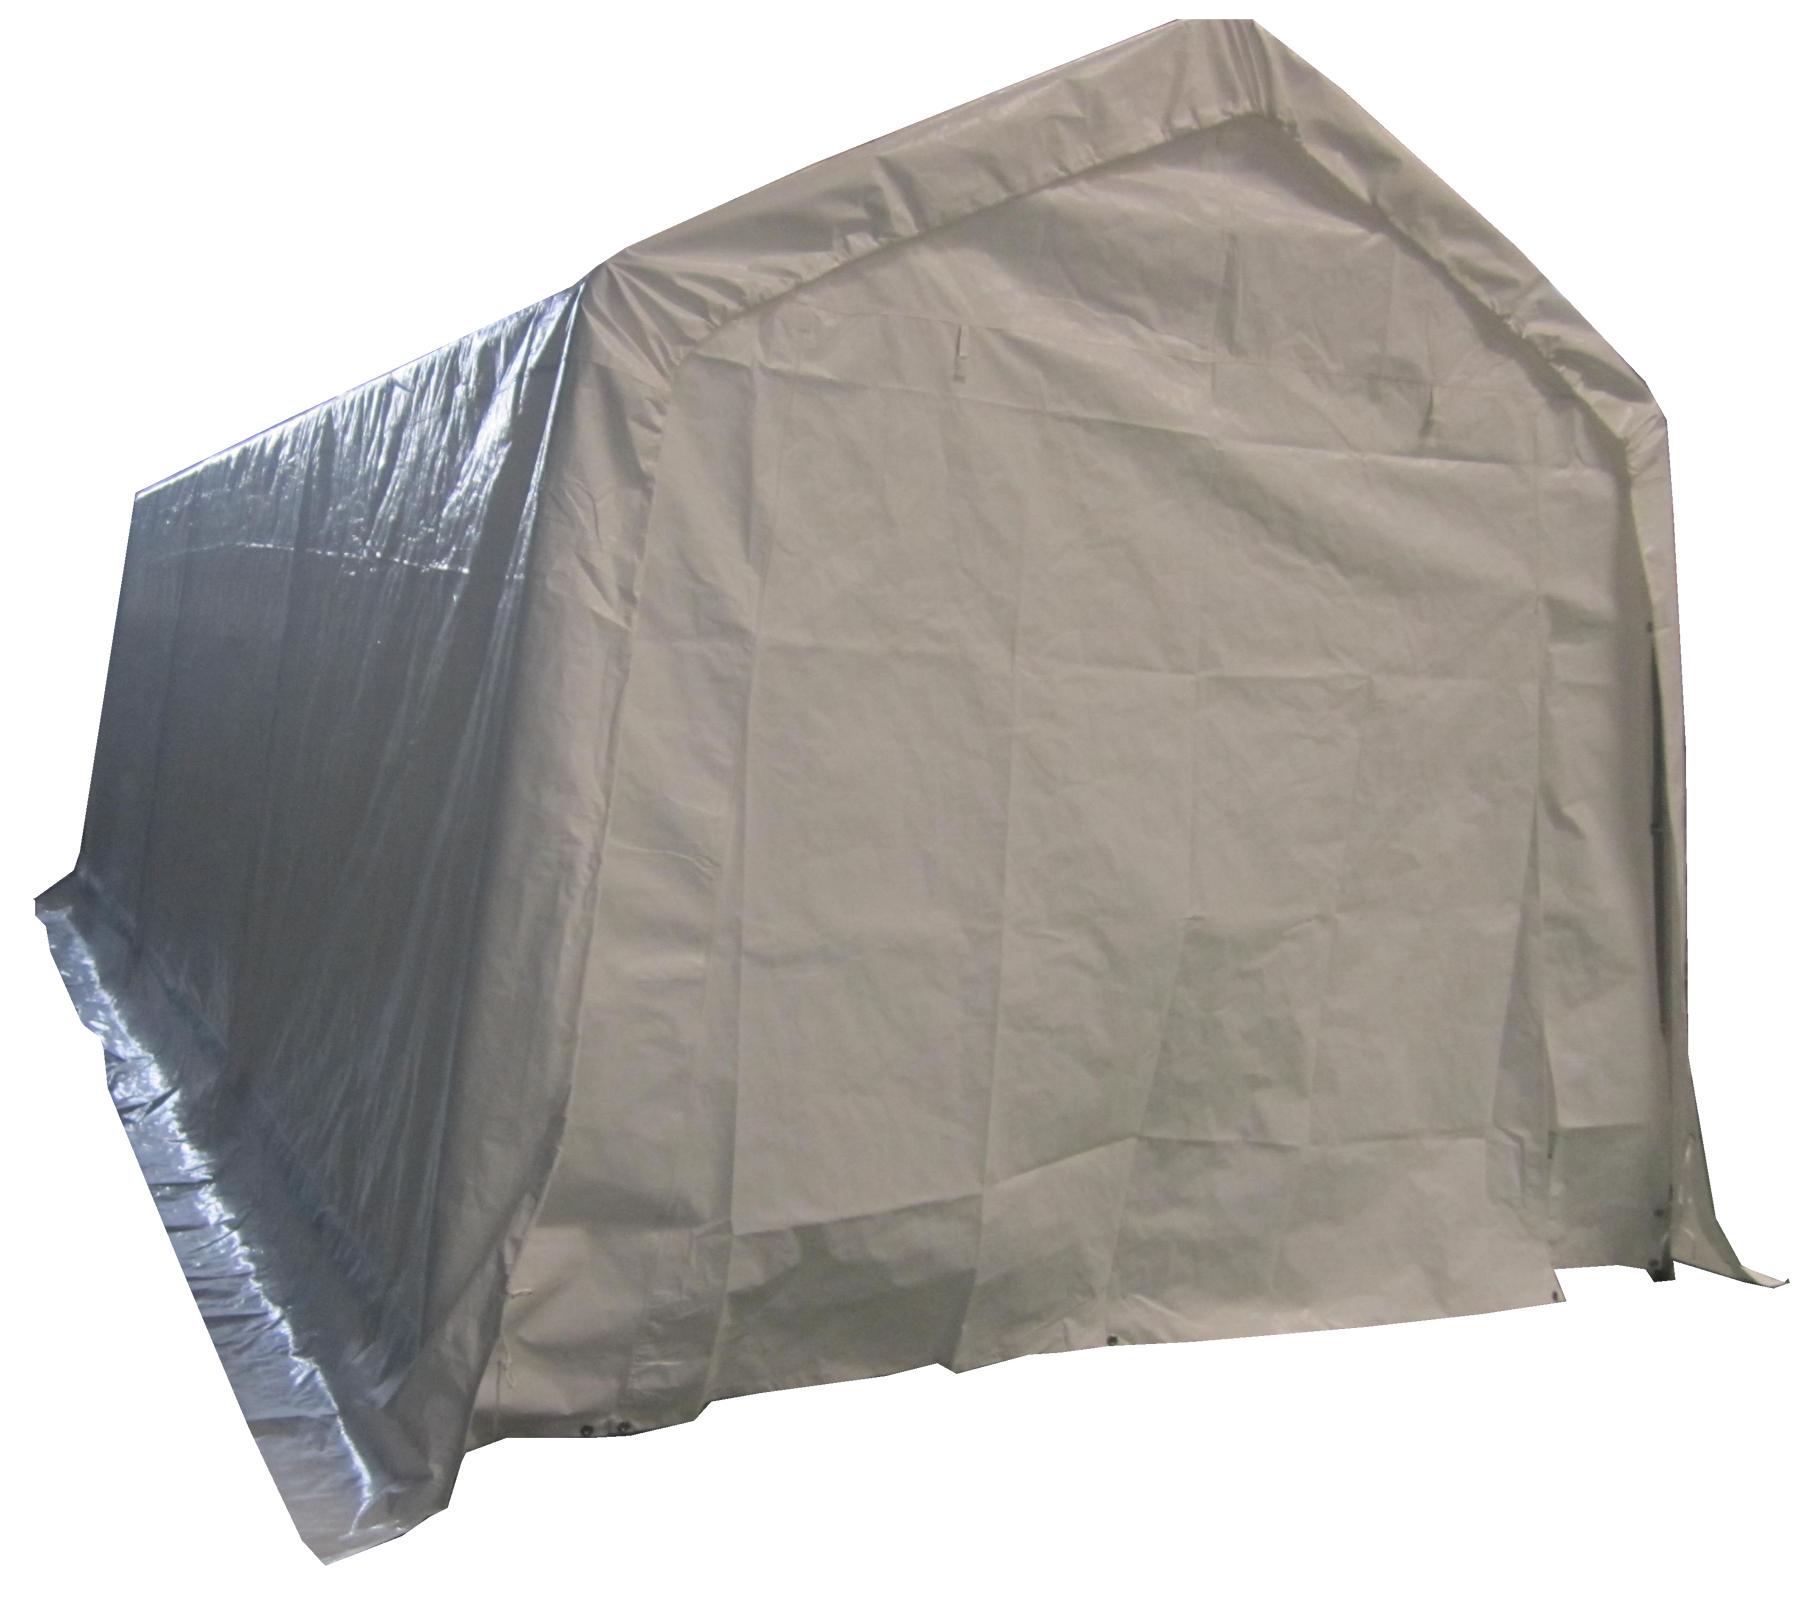 BIRCHTREE Garage Carport Shelter Car Port Canopy 3m x 6m ...